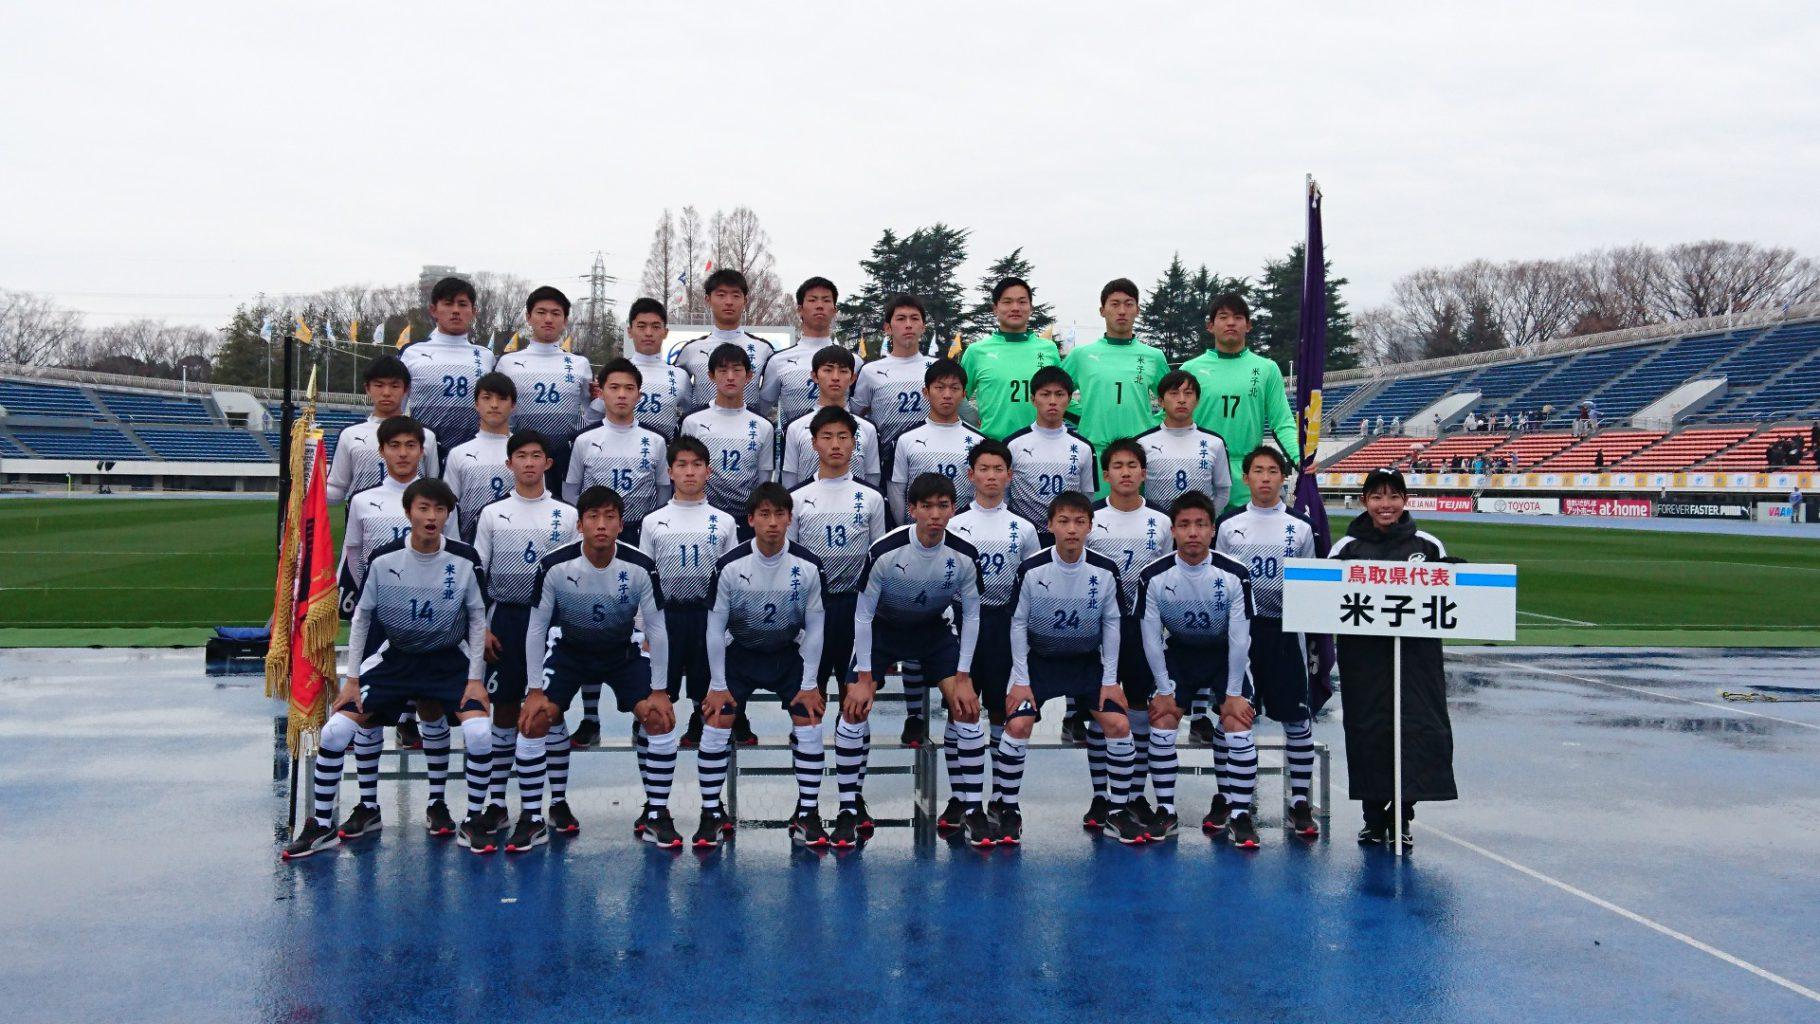 第98回 全国高校サッカー選手権大会 開幕!